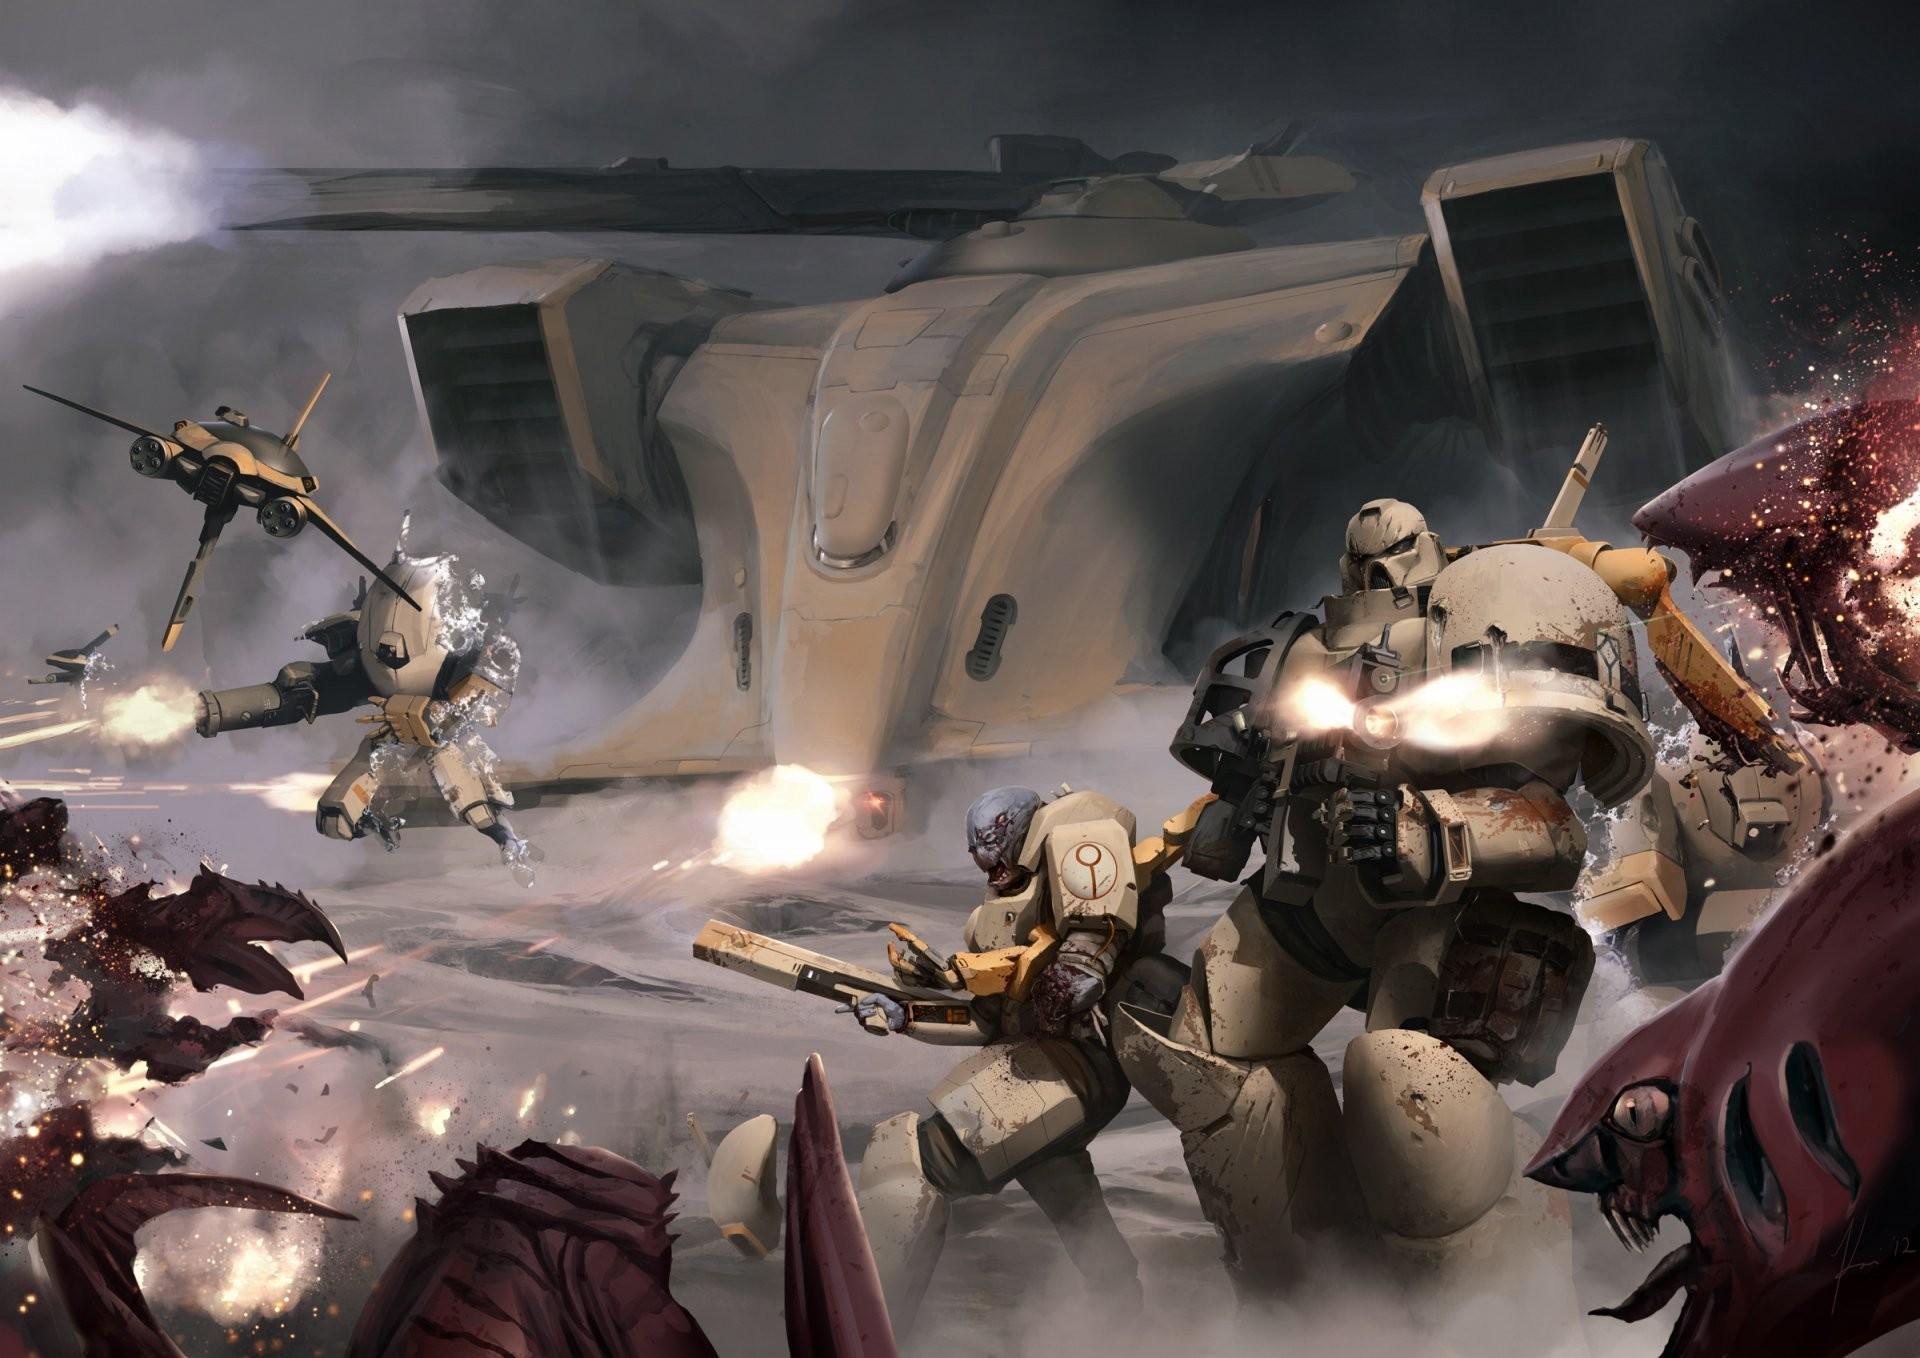 warhammer 40k space marines tau xv25 tyranid space marines tau tyranids  fight